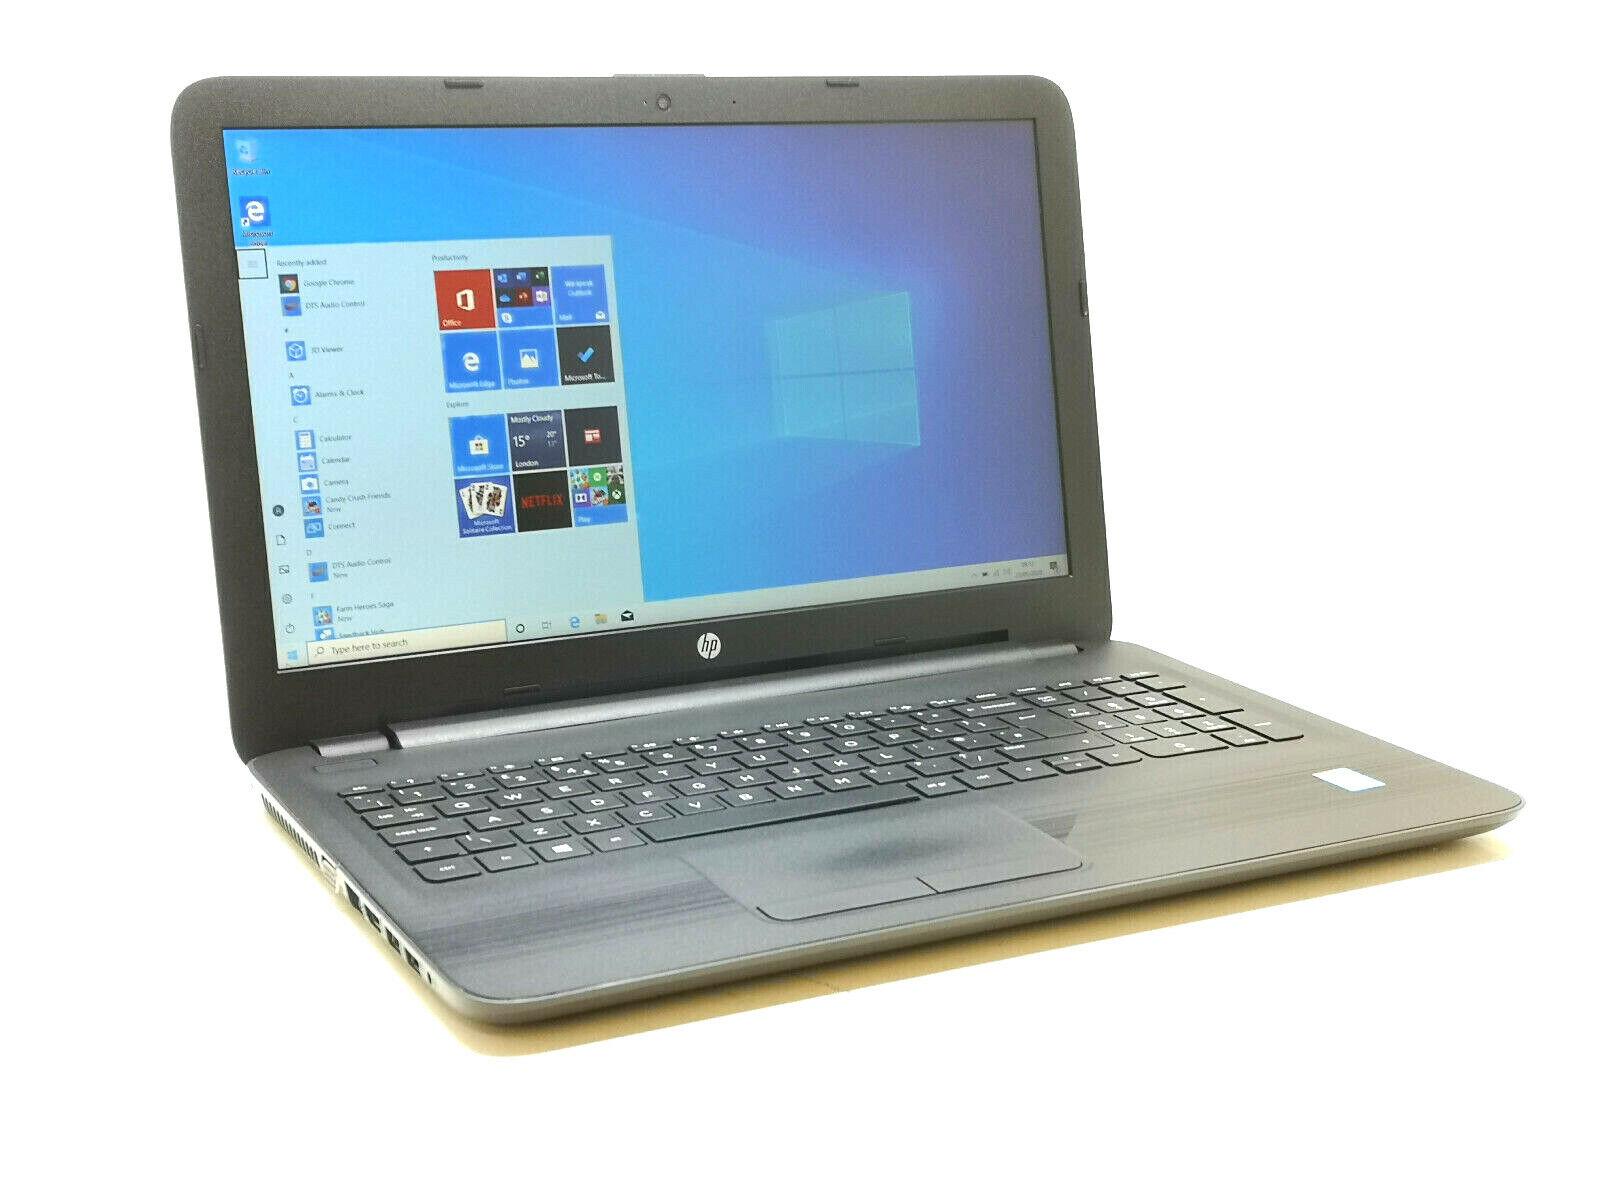 Laptop Windows - HP 250 G5 - CORE i3 5th Gen, 8GB RAM, 250GB SSD, WiFi, Voice, HD, Windows 10